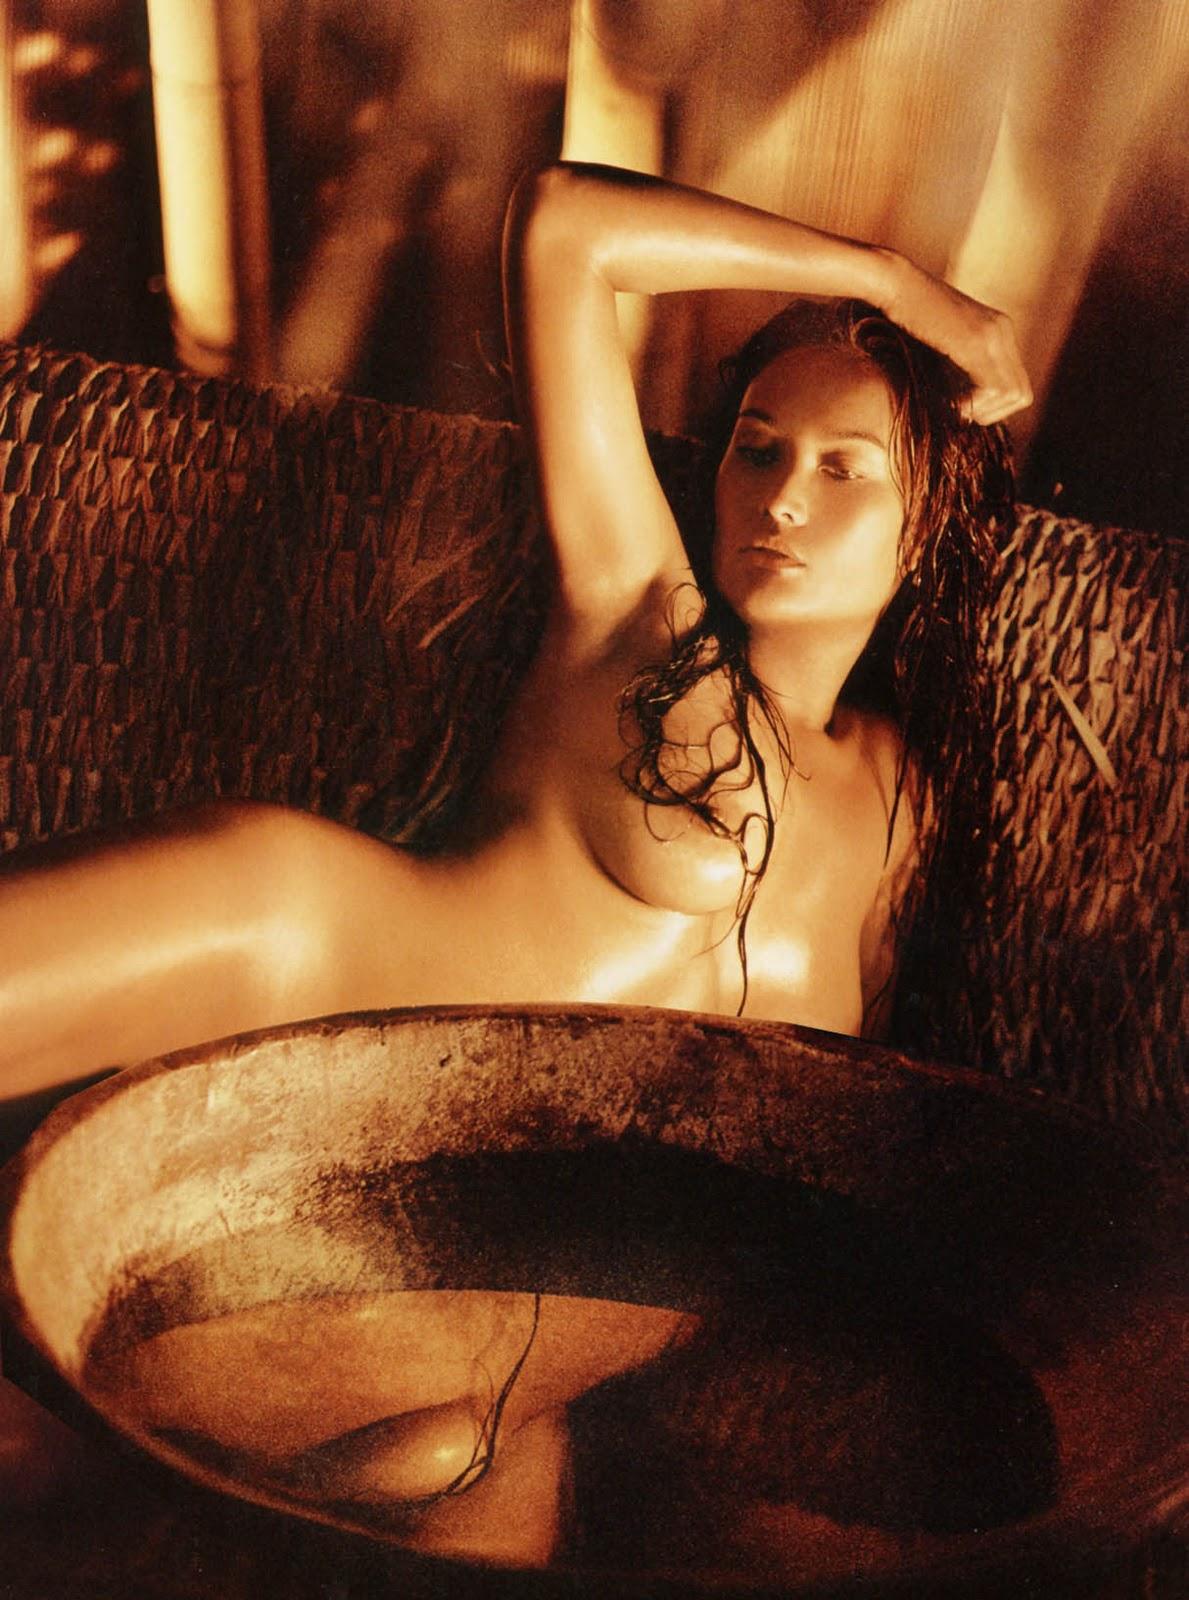 hema nude sex naket fucking pussy photo